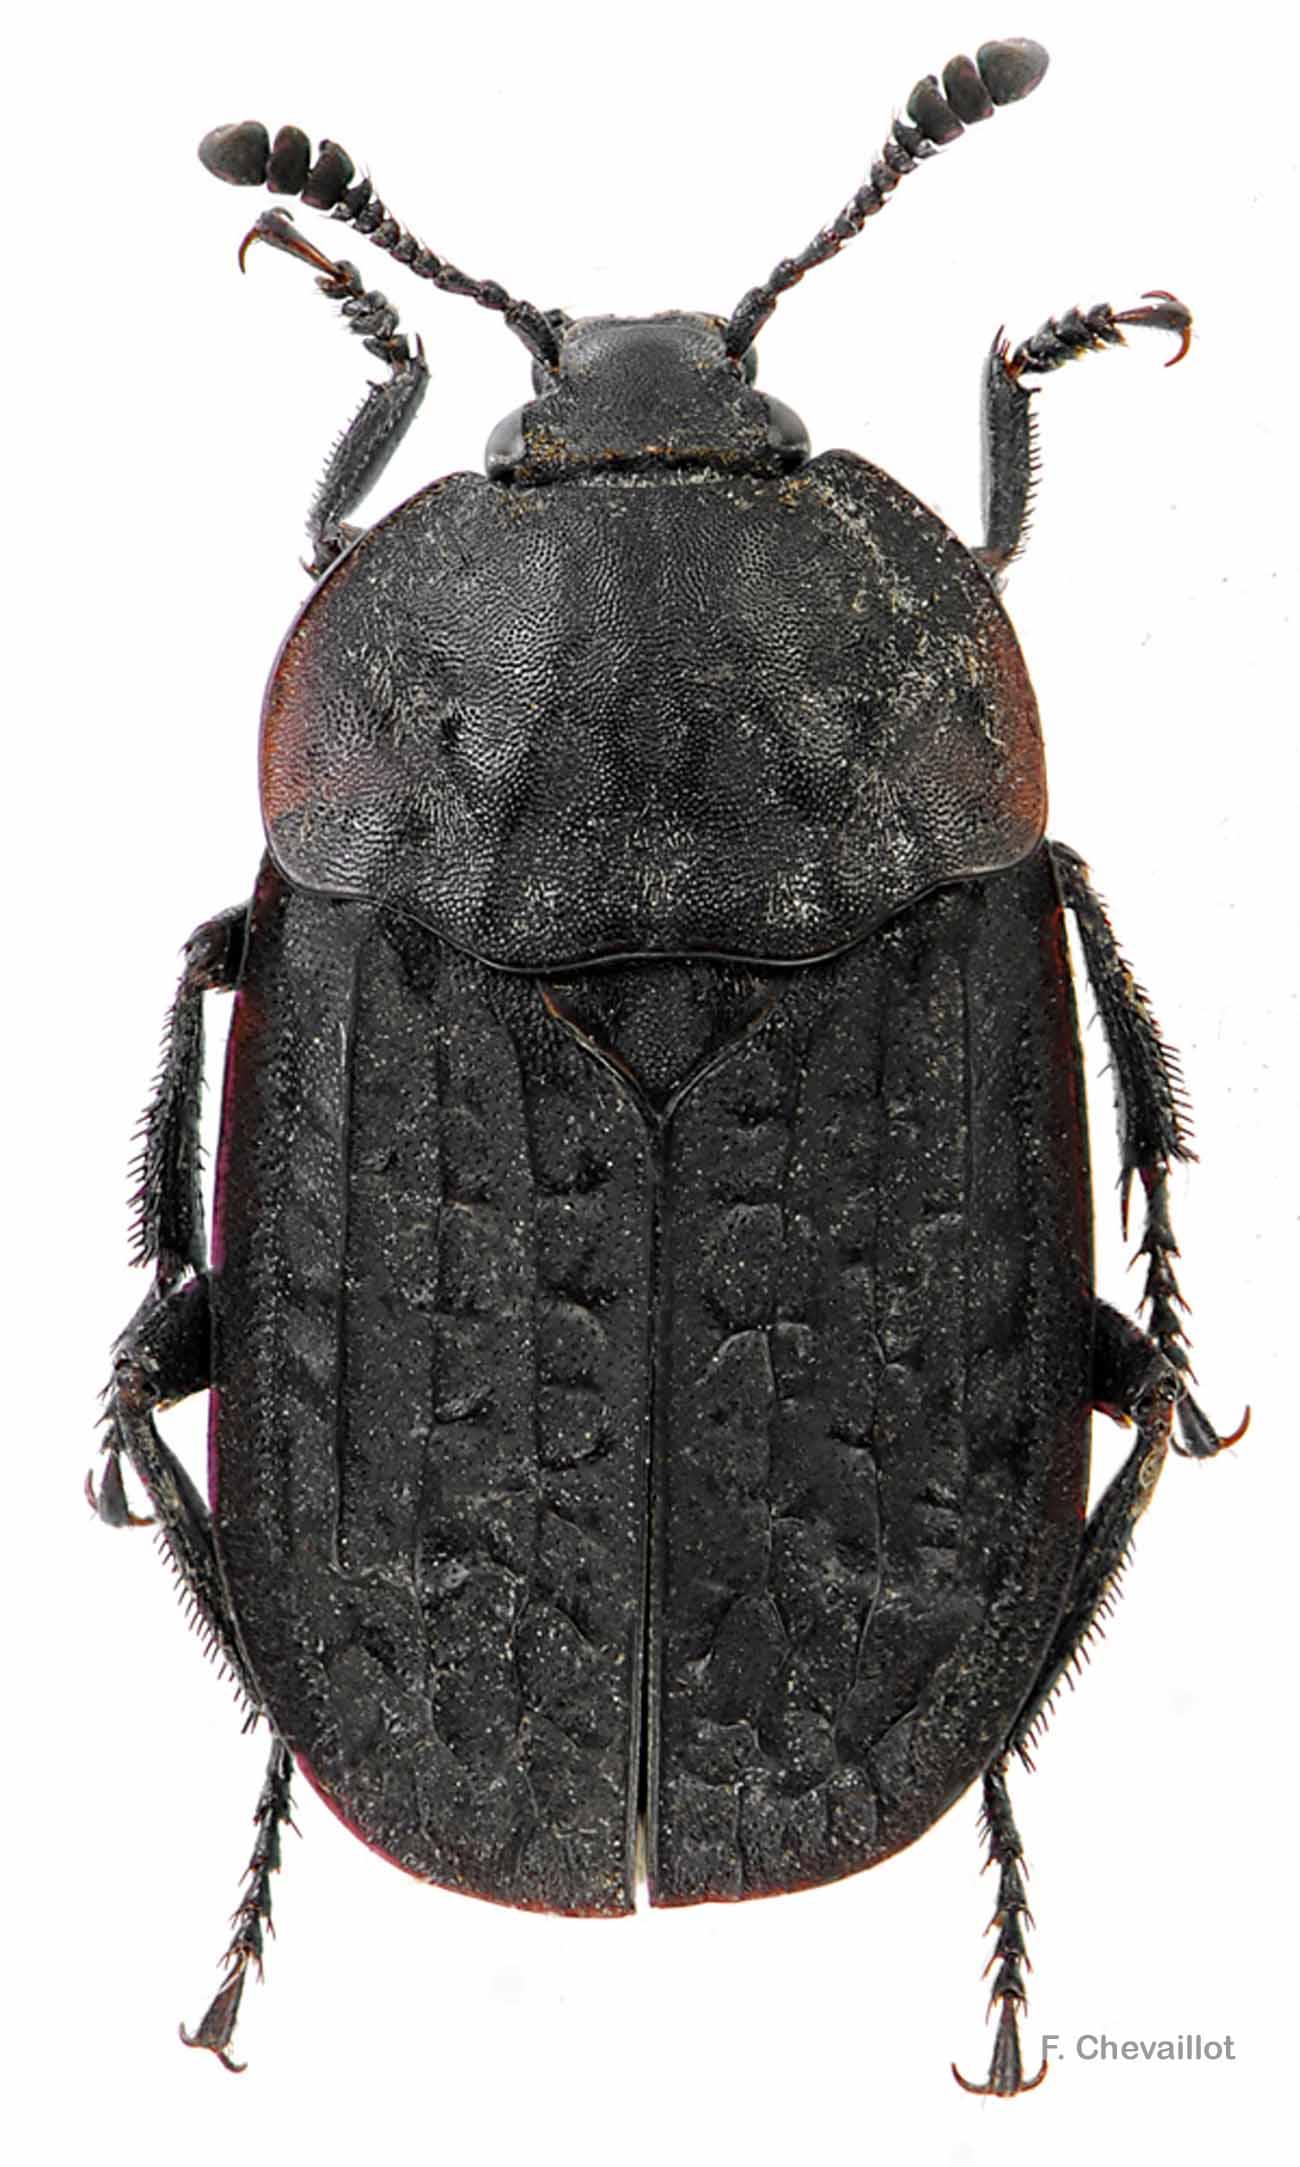 Thanatophilus rugosus